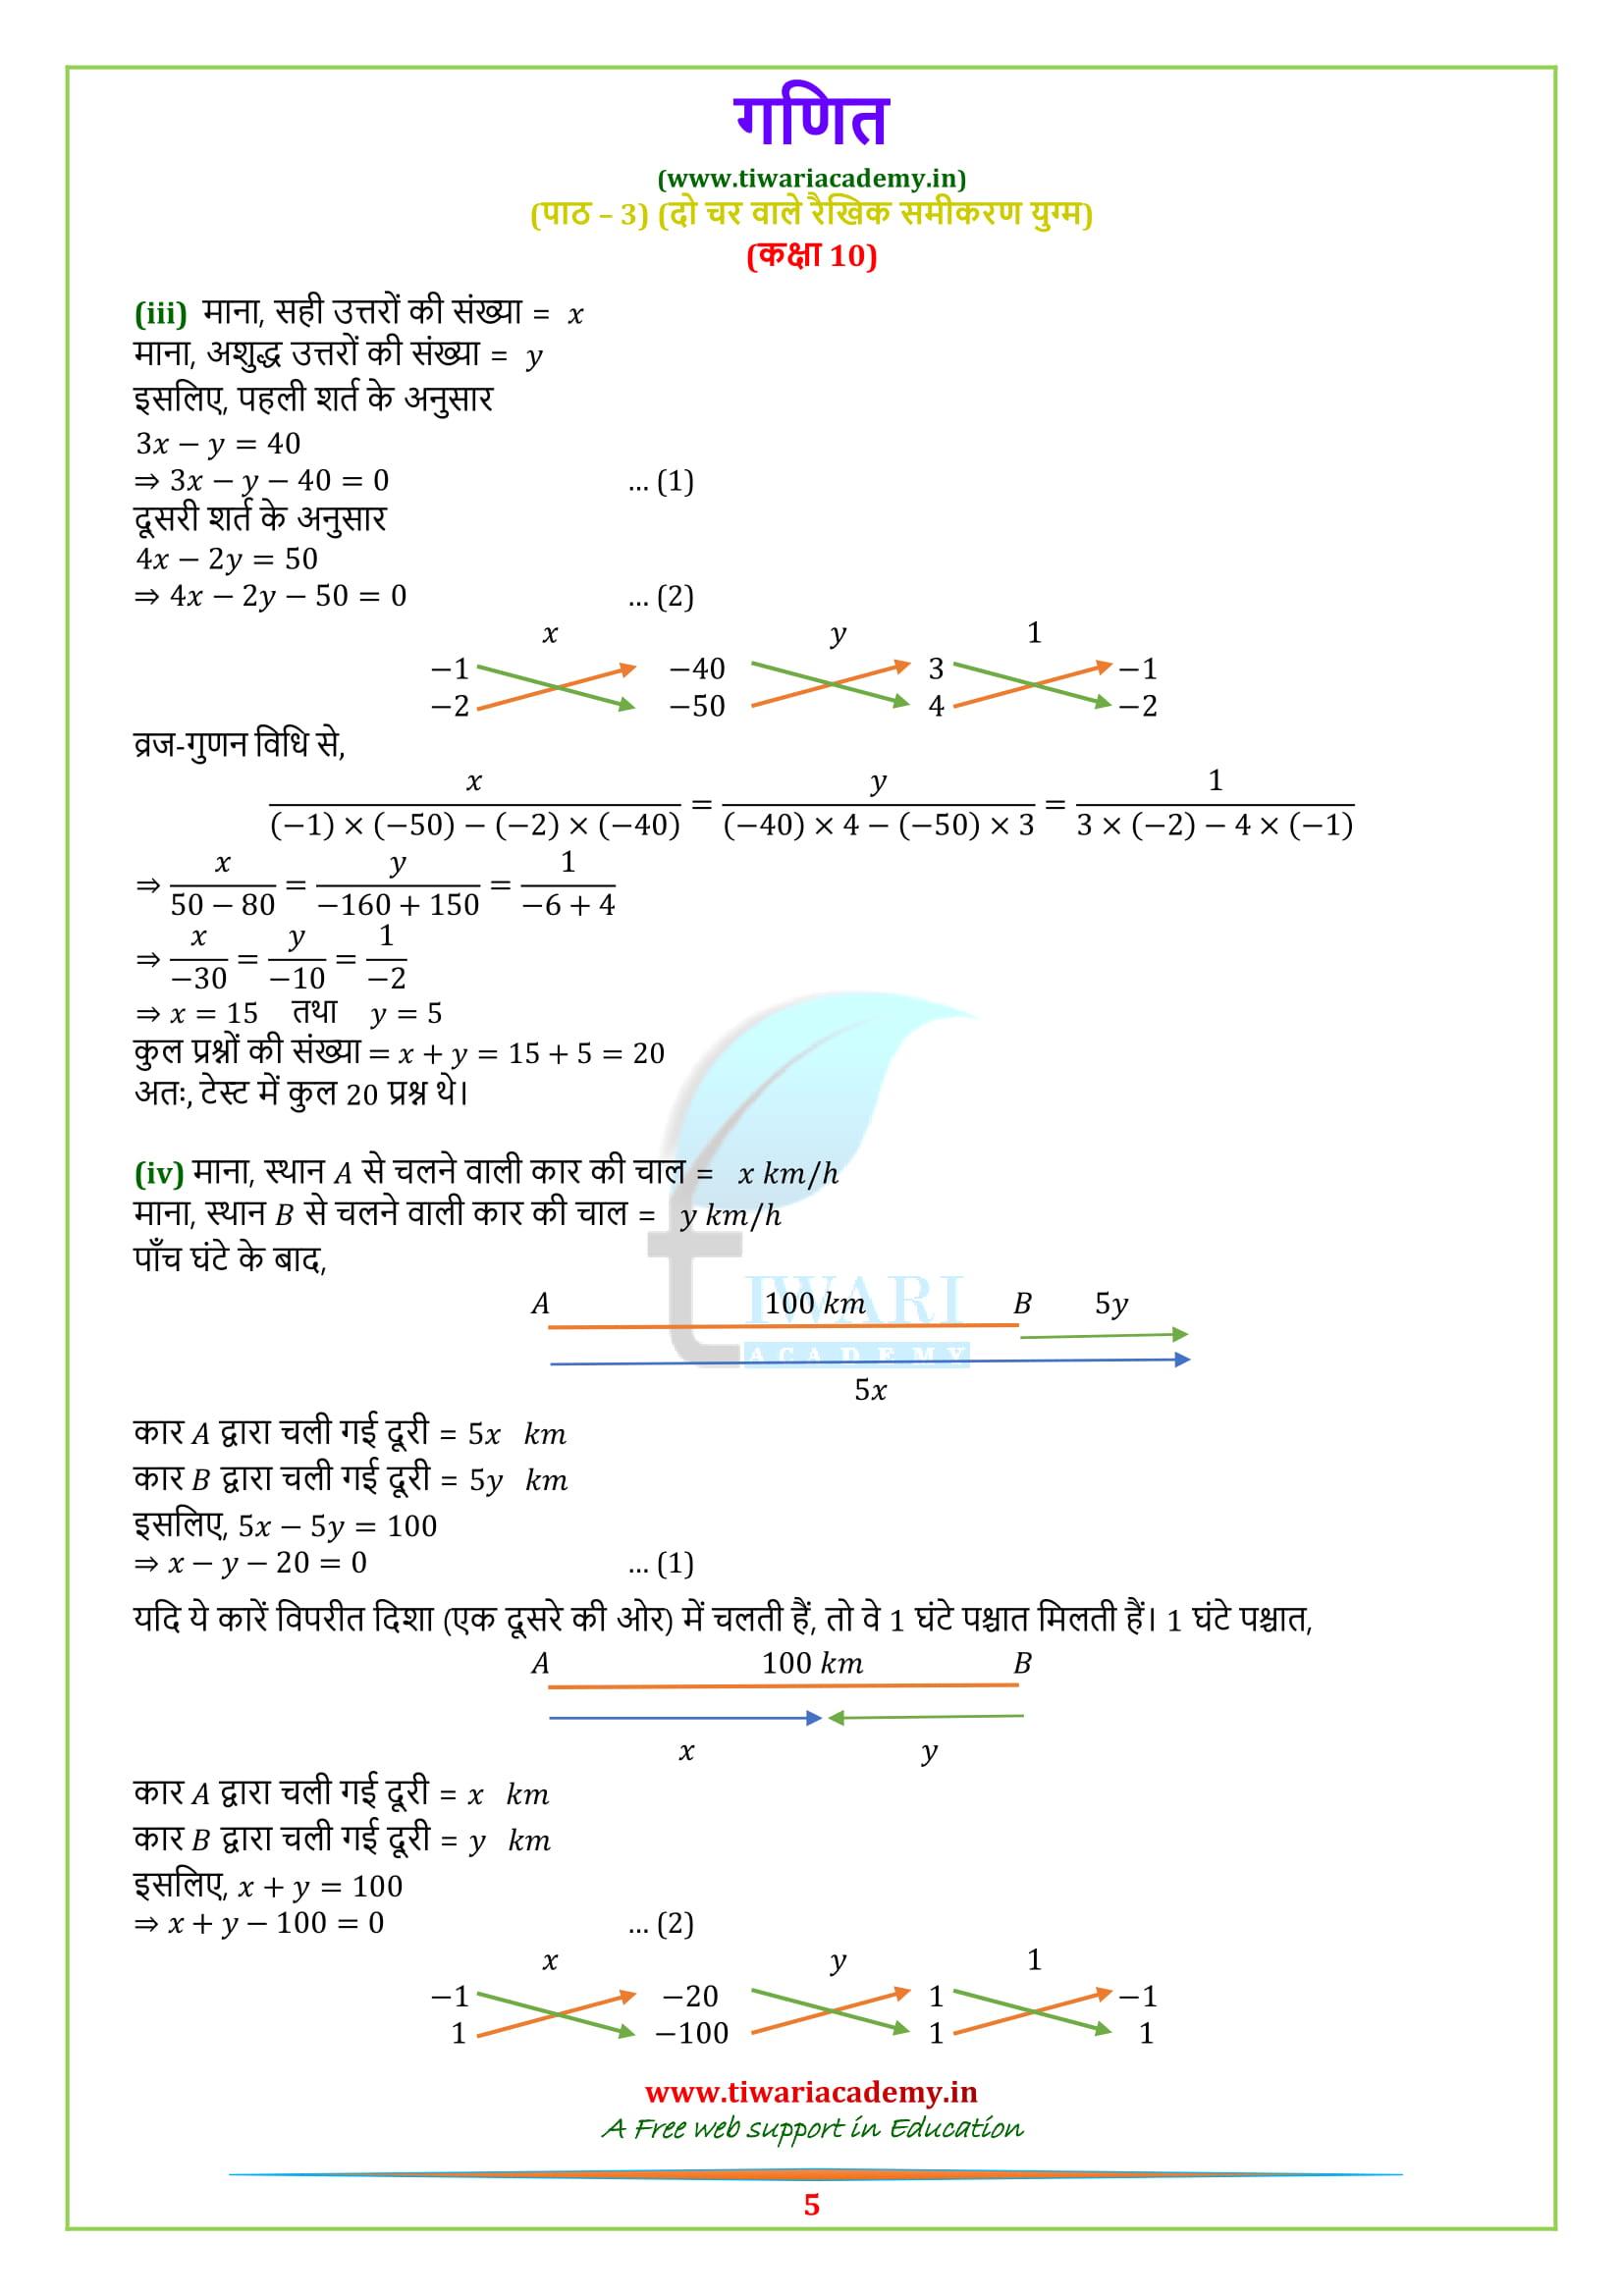 Class 10 Maths Exercise 3.5 ke solutions up board and mp board ke lie